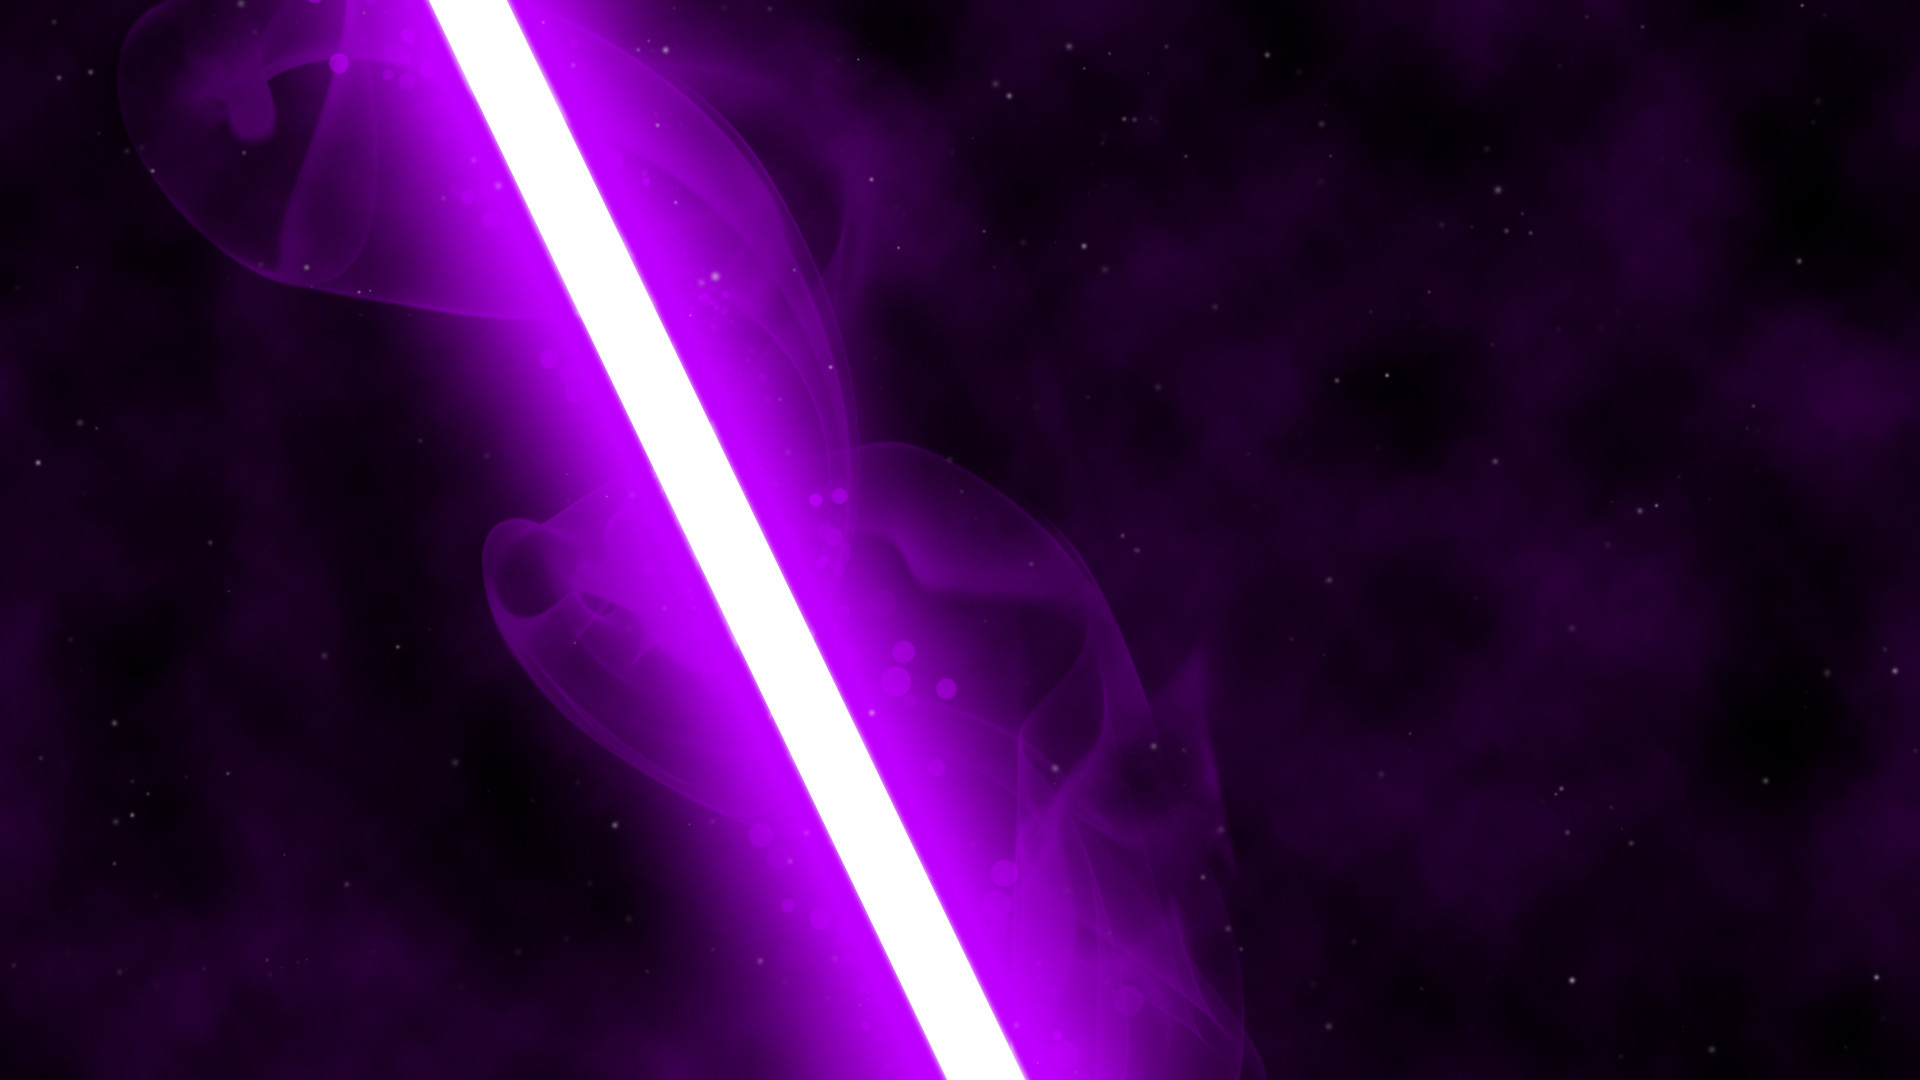 … purple lightsaber wallpaper wallpapersafari; lightsaber hd …